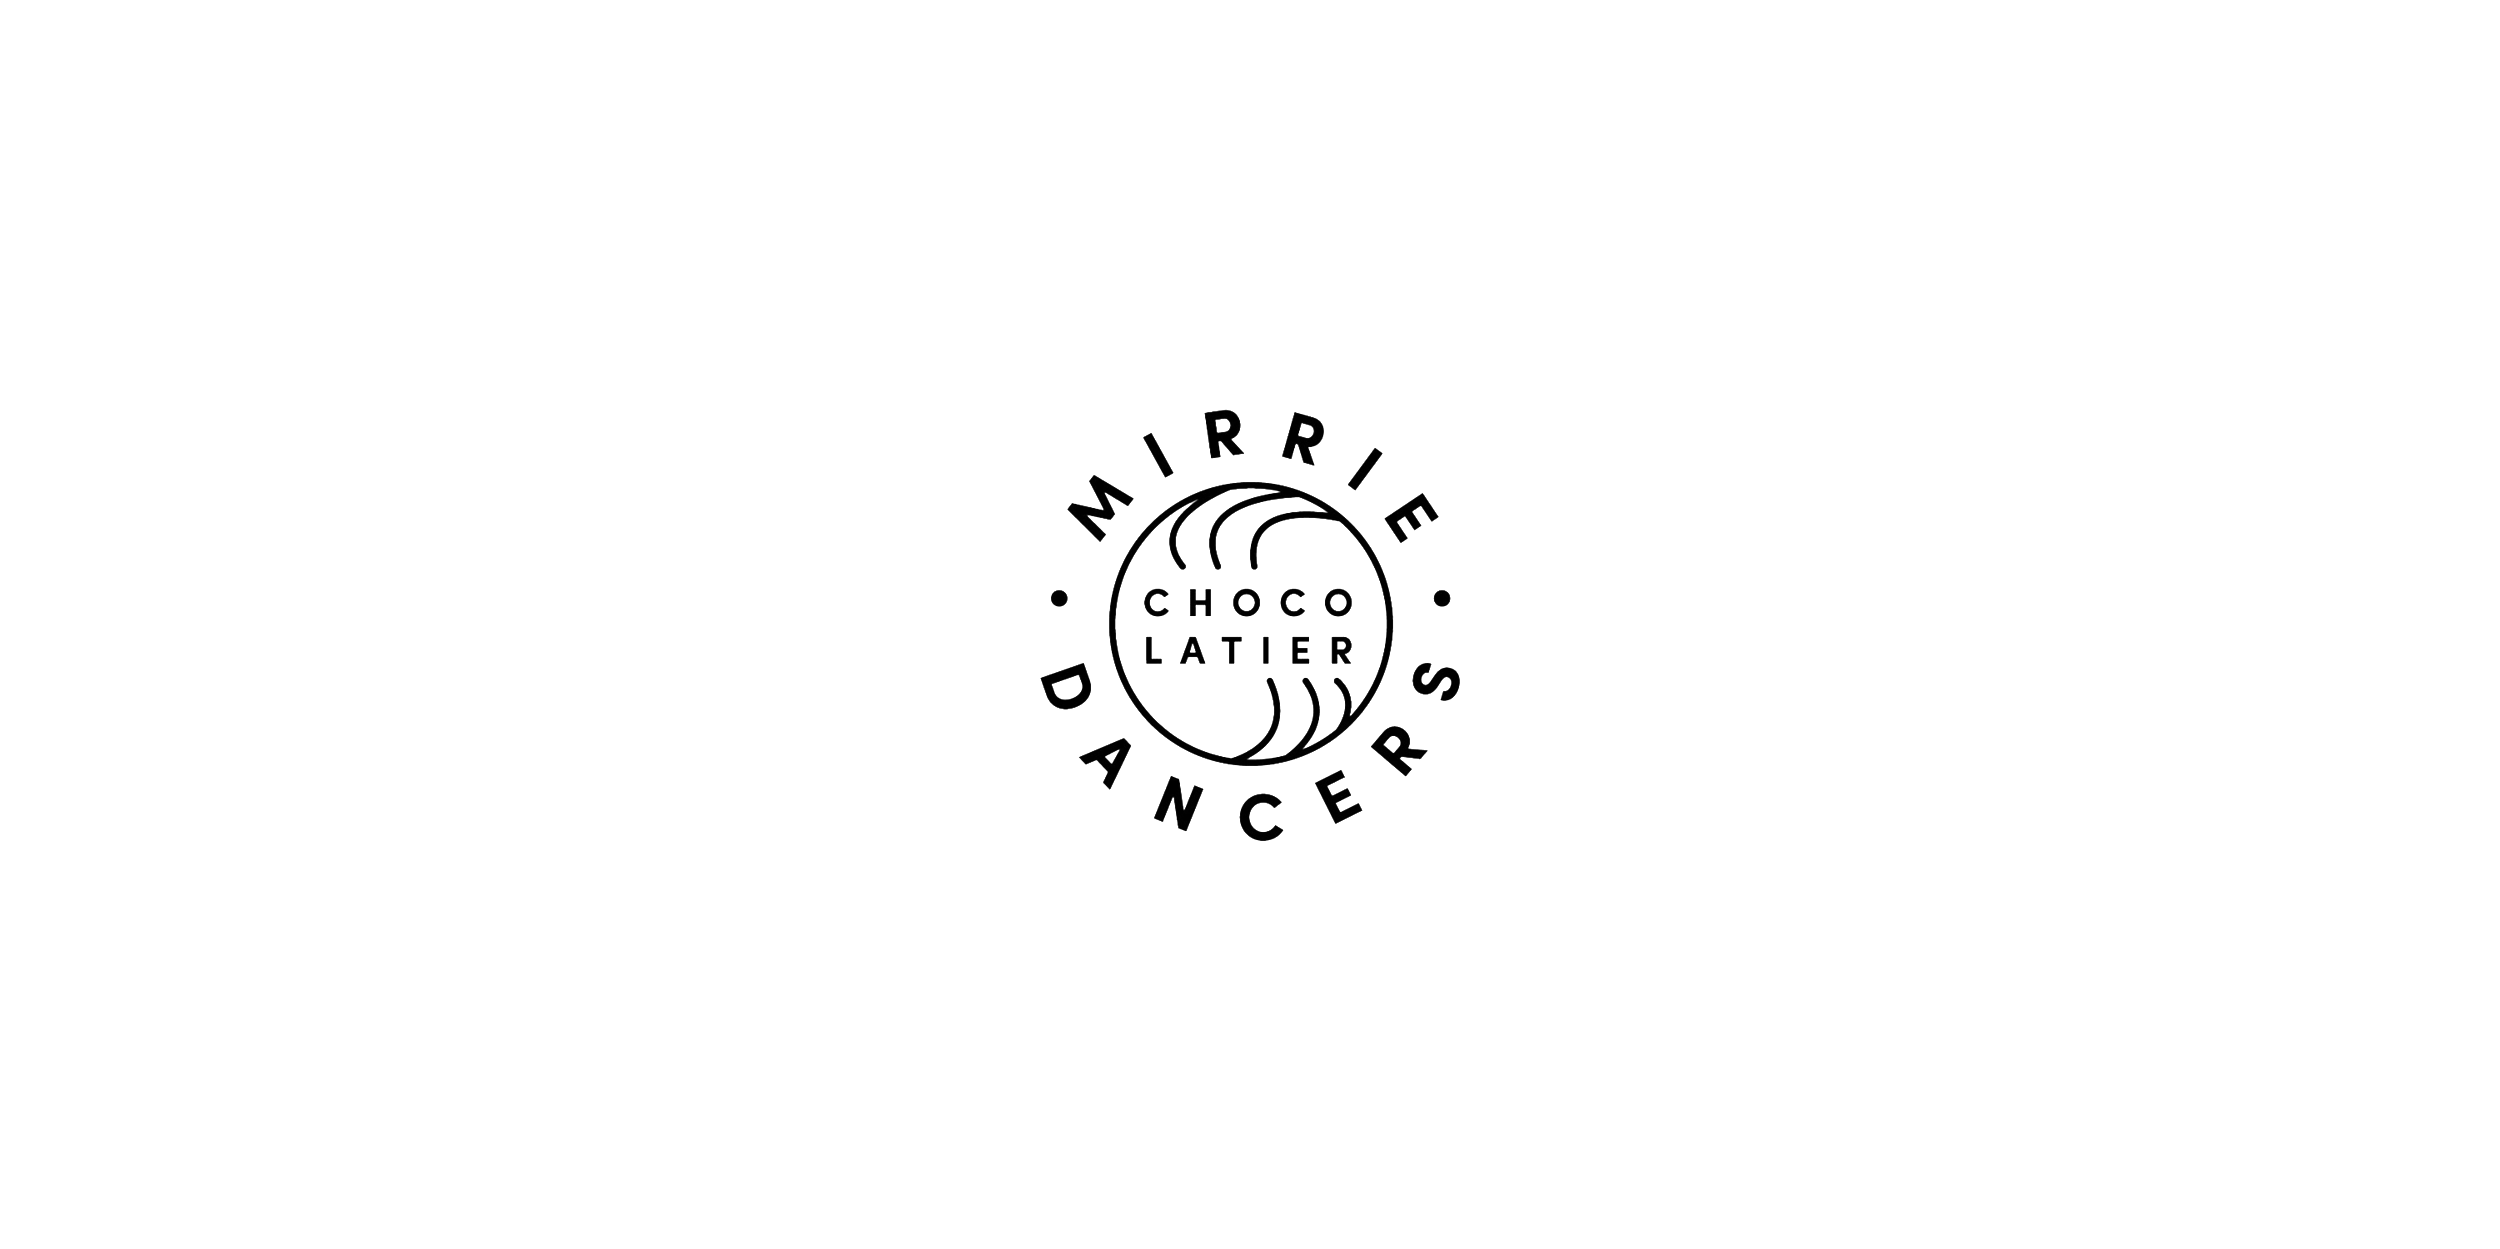 MD webfolio logo 2.png